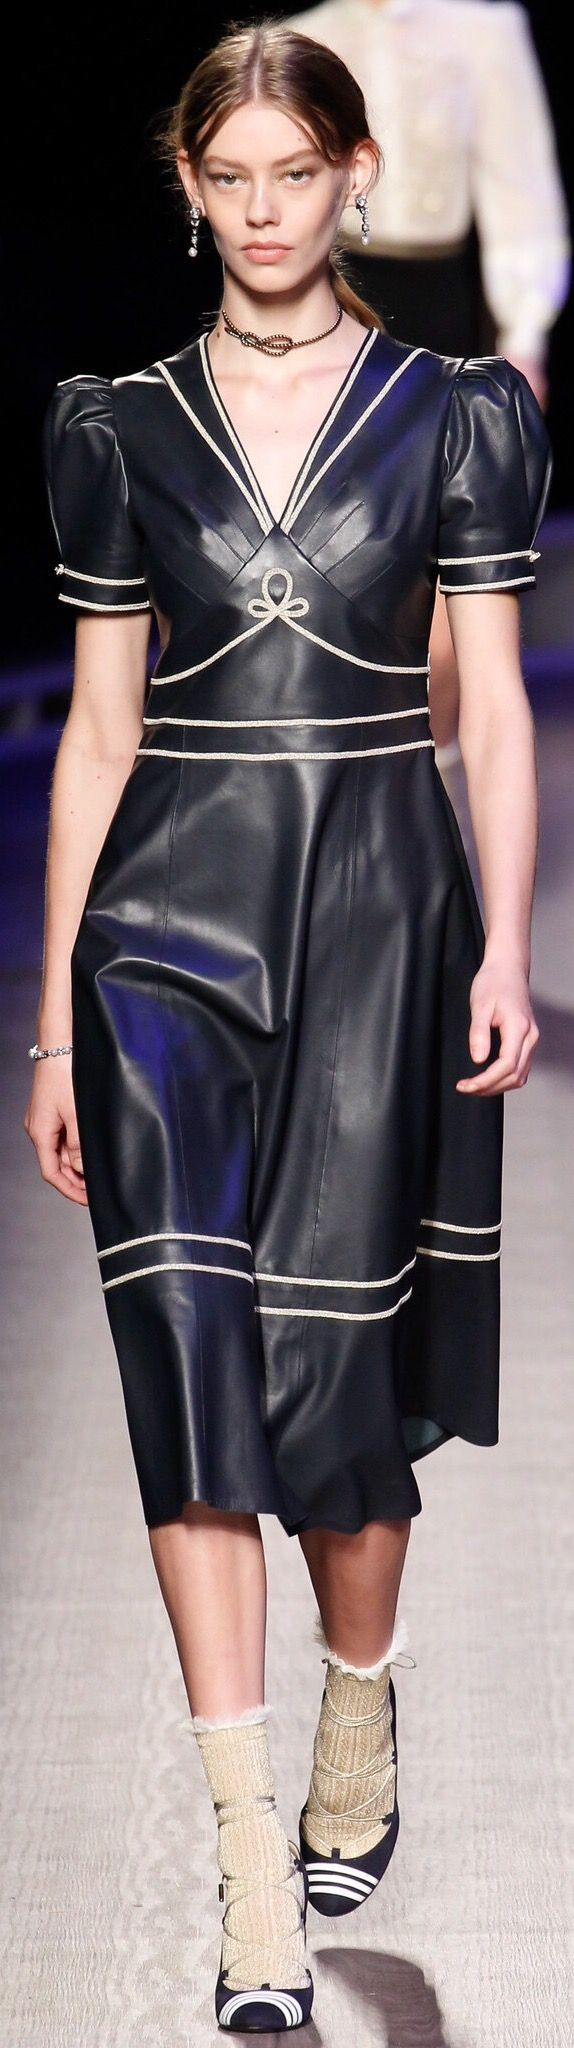 Tommy Hilfiger, fall 2016 Ready-to-Wear